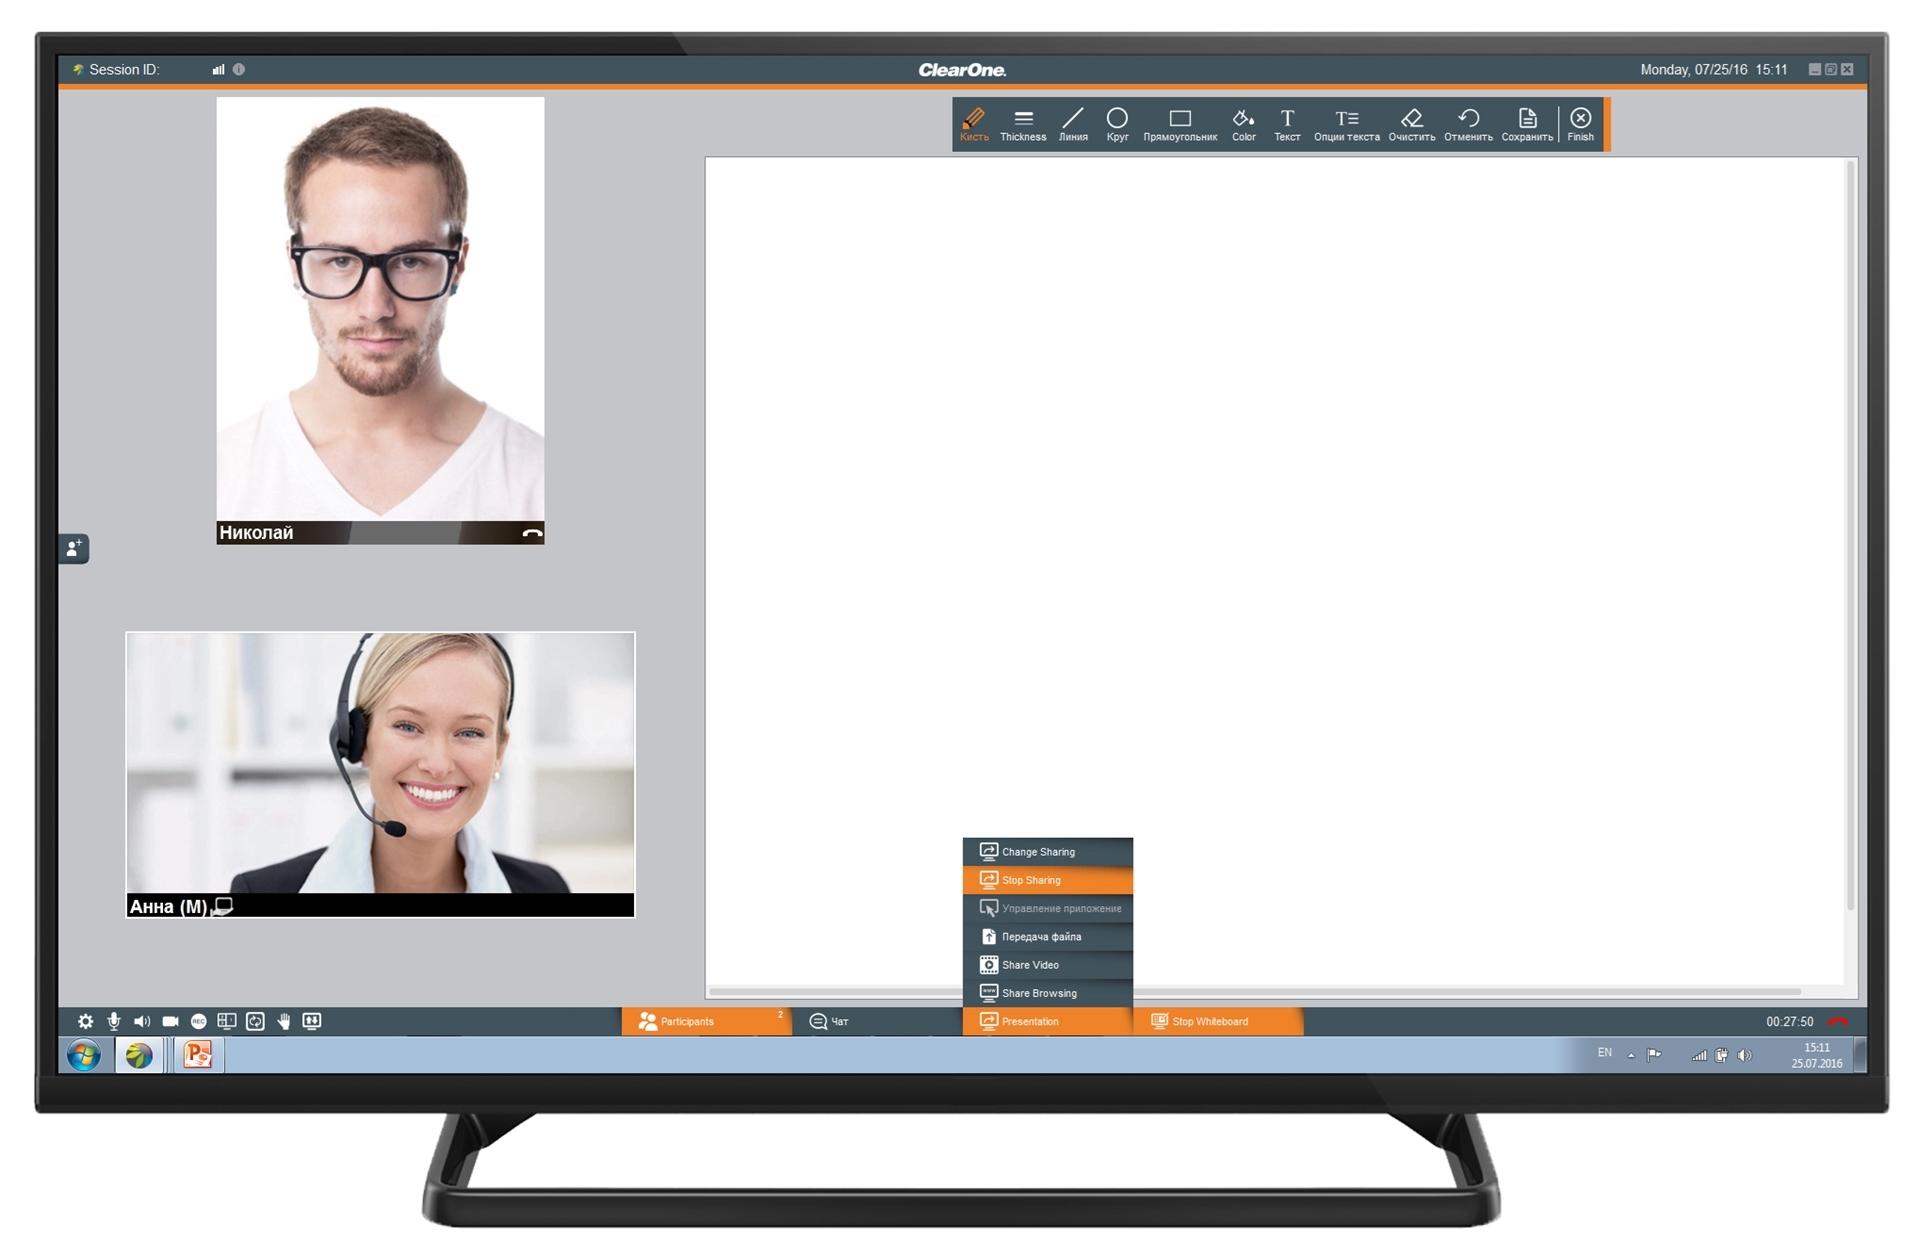 ClearOne Sp Ent 250 - Программный продукт Spontania Enterprise - 250